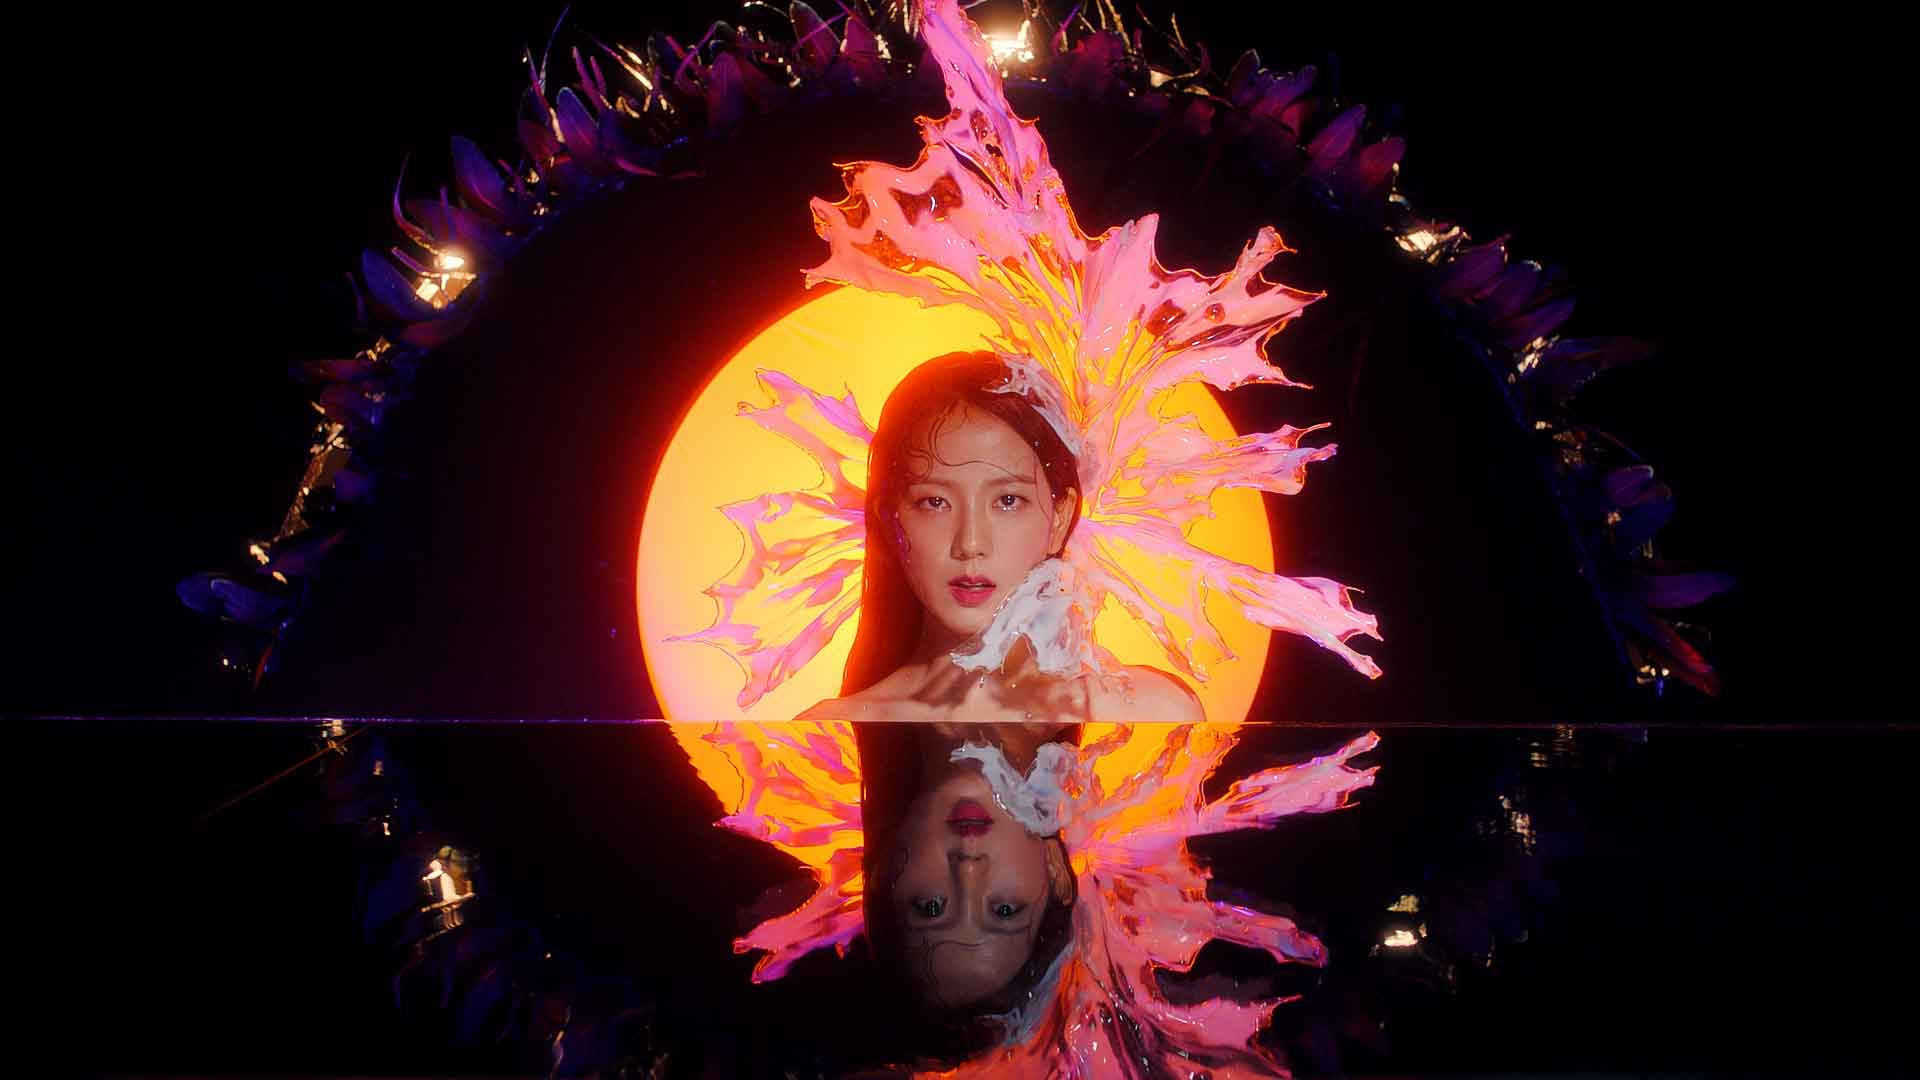 [1080P] Blackpink - Kill This Love ( Master - 4.09G/百度网盘)